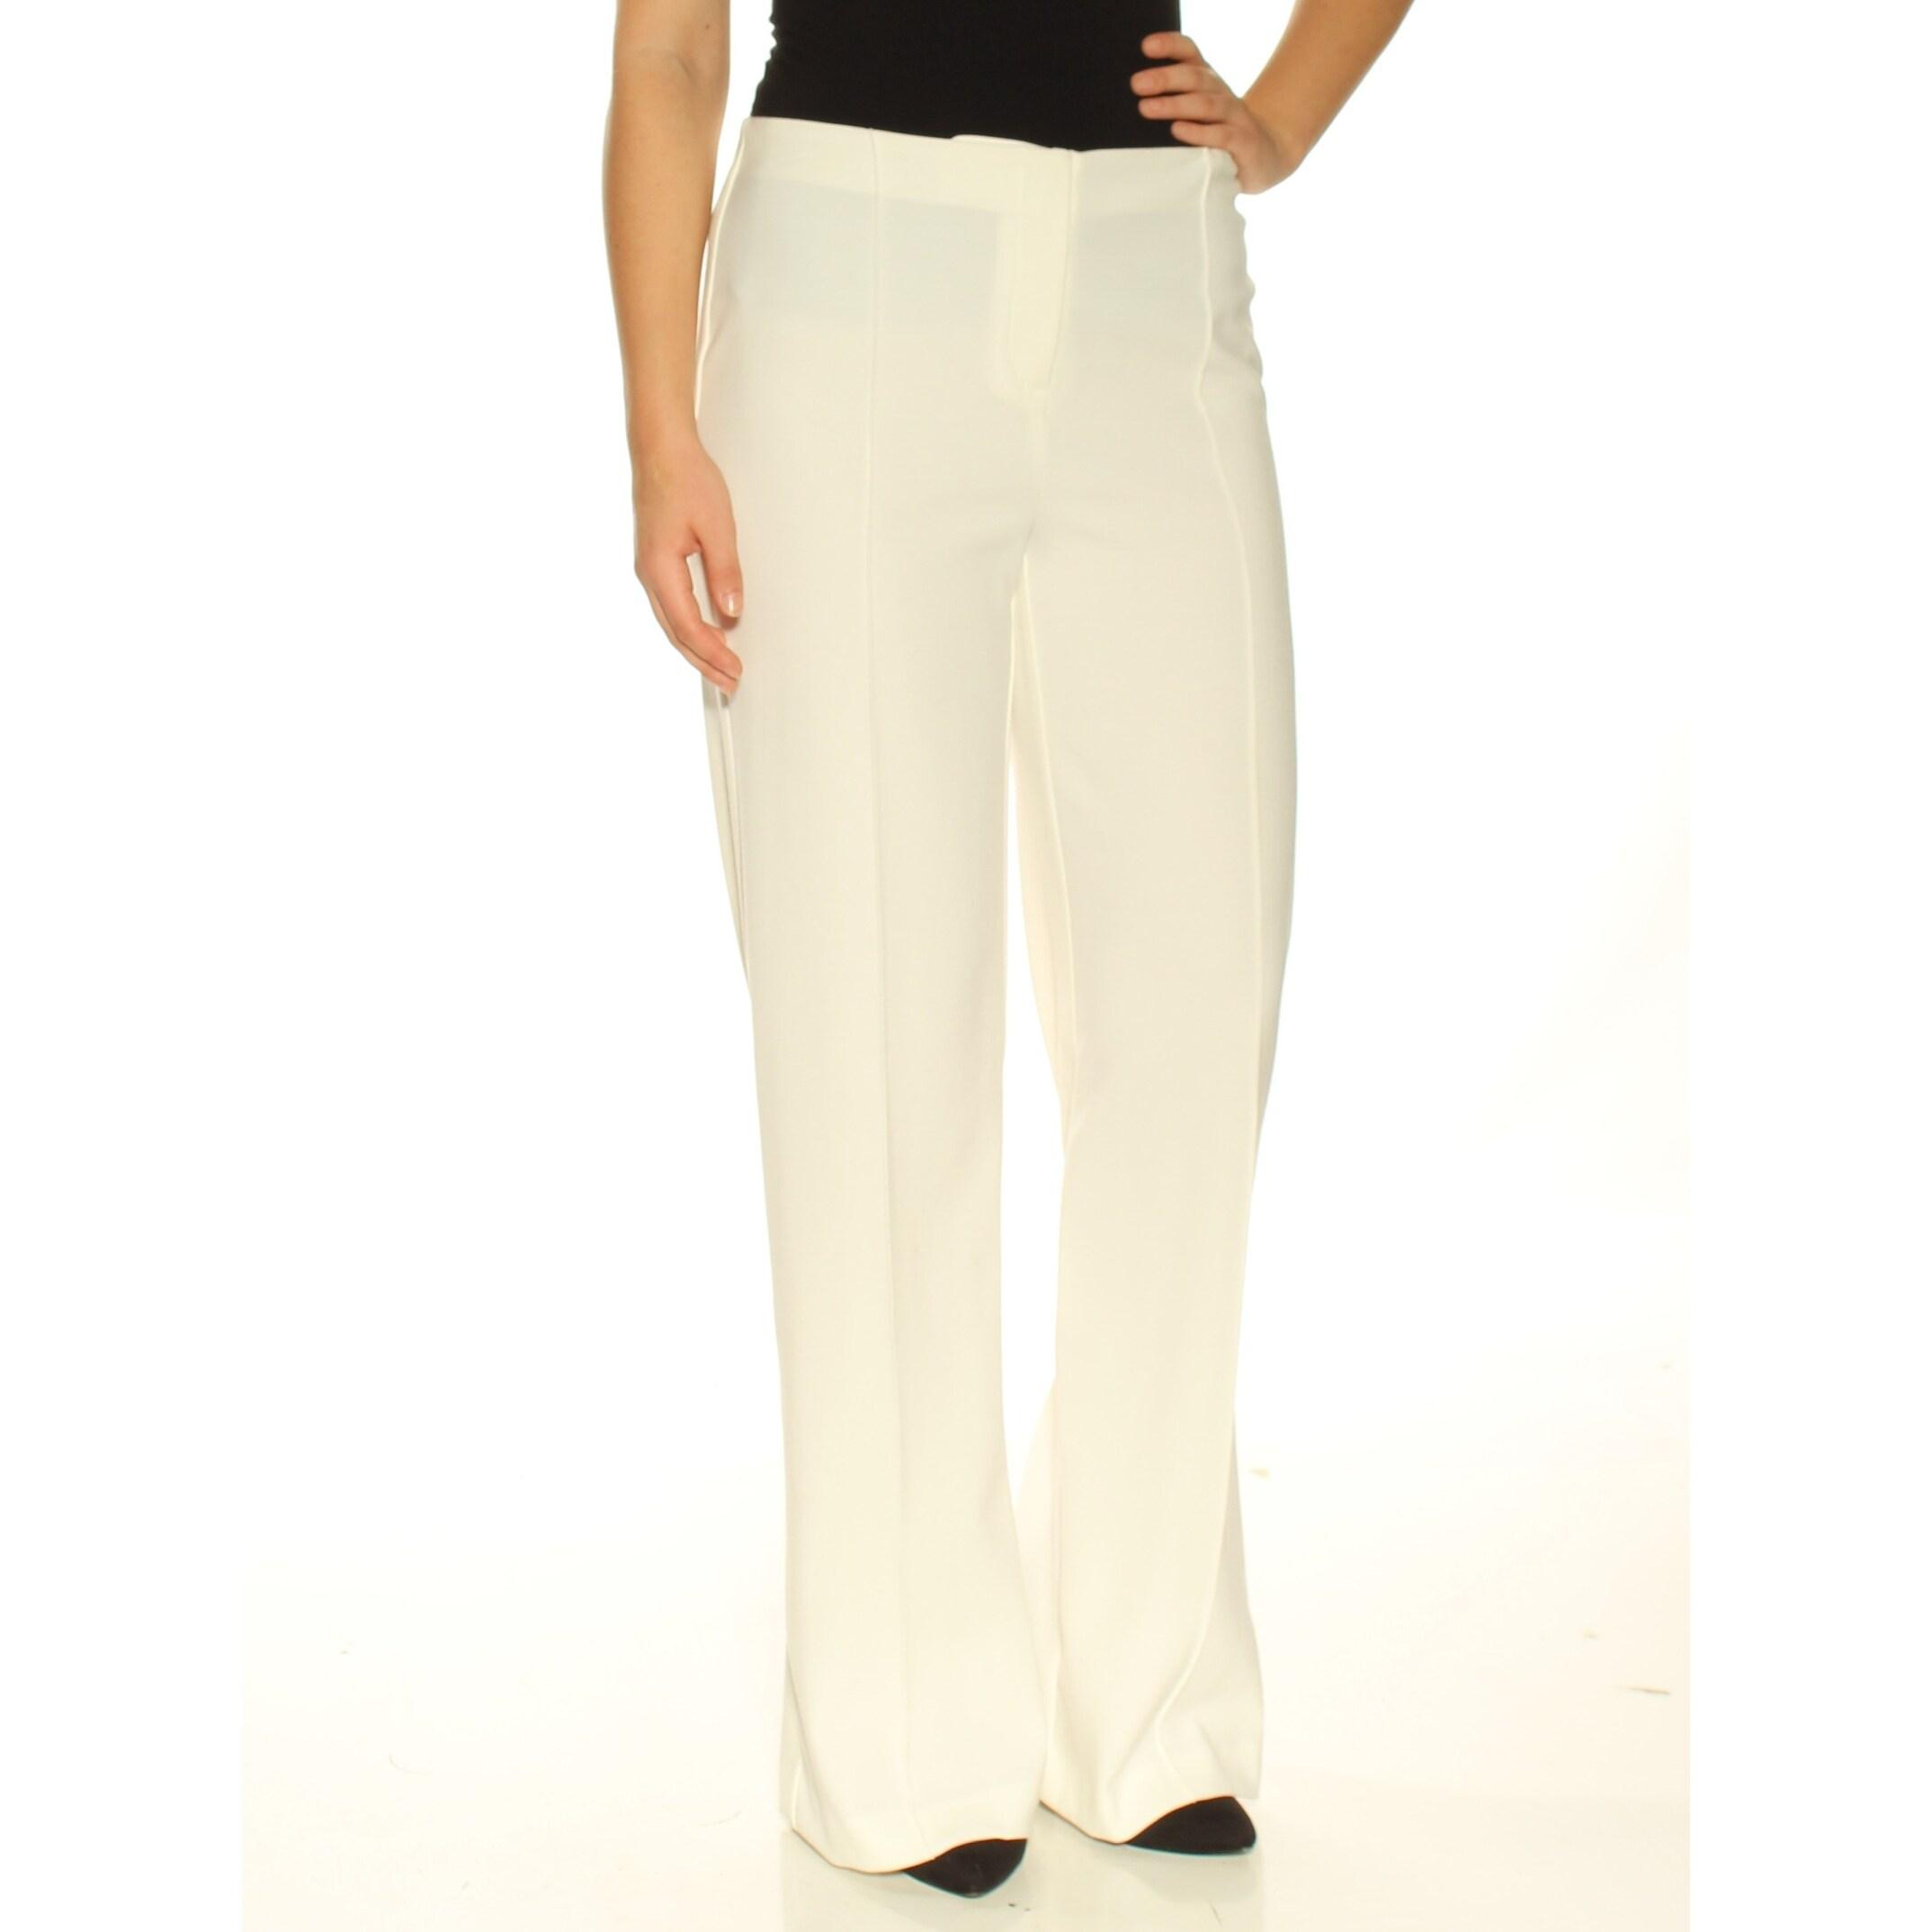 d56024a572 Wide Leg Dress Pants Style - raveitsafe